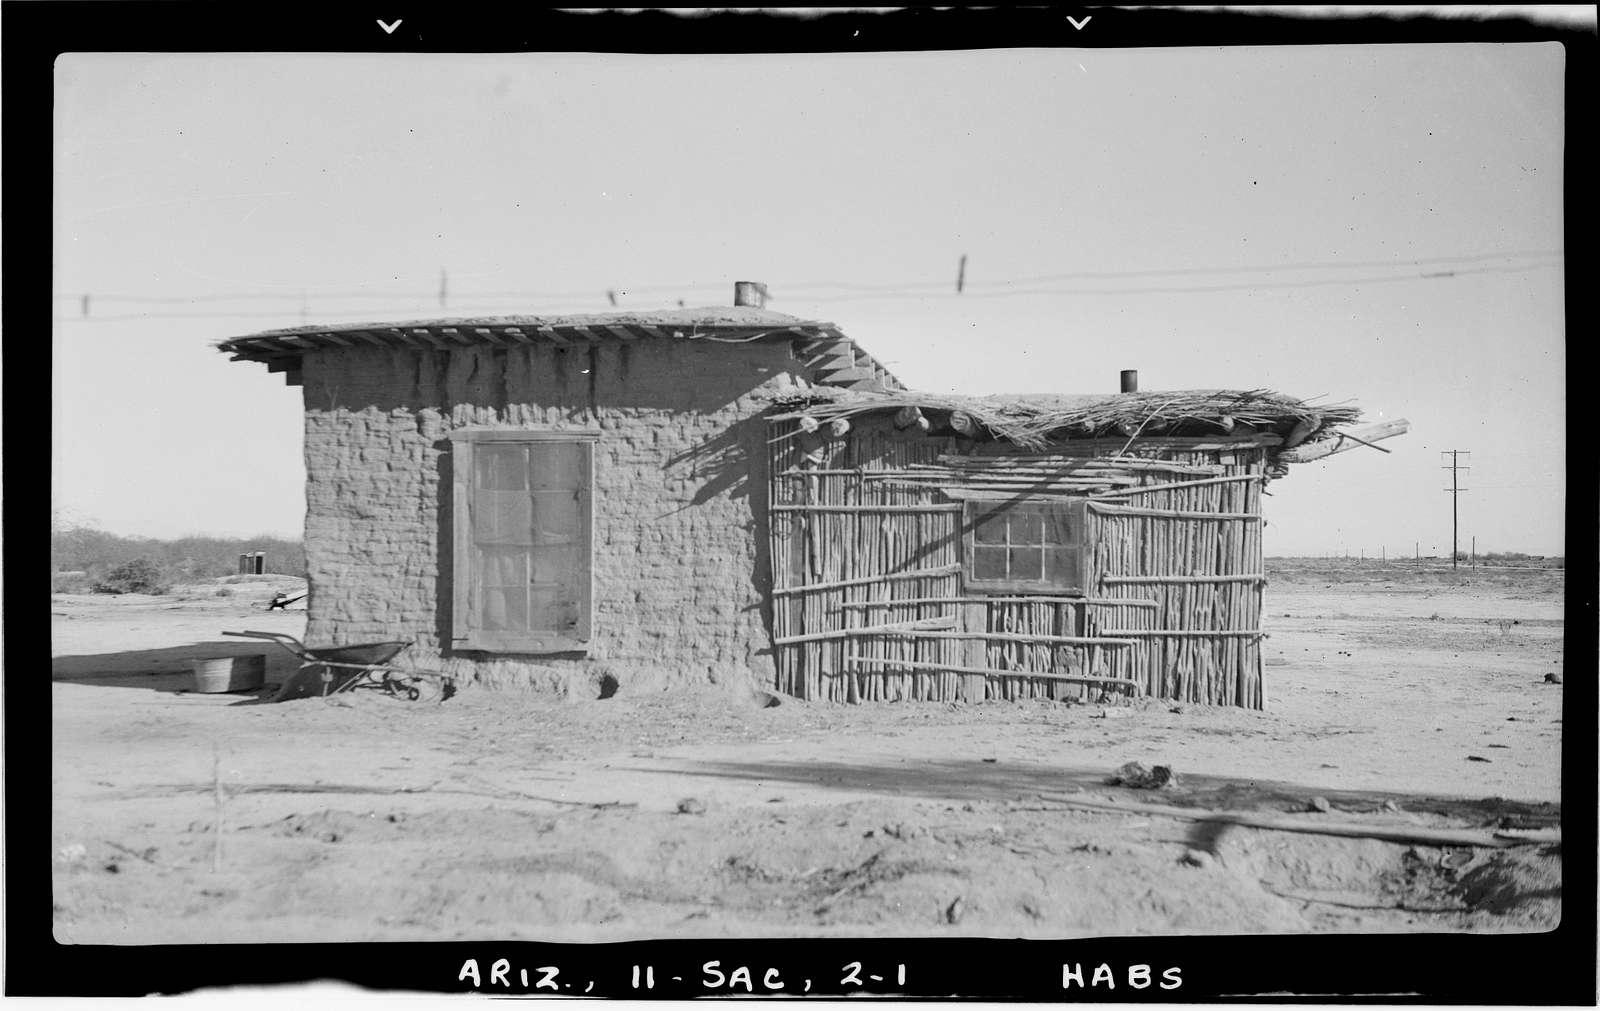 Indian House, Vah Ki Vicinity, Sacaton, Pinal County, AZ